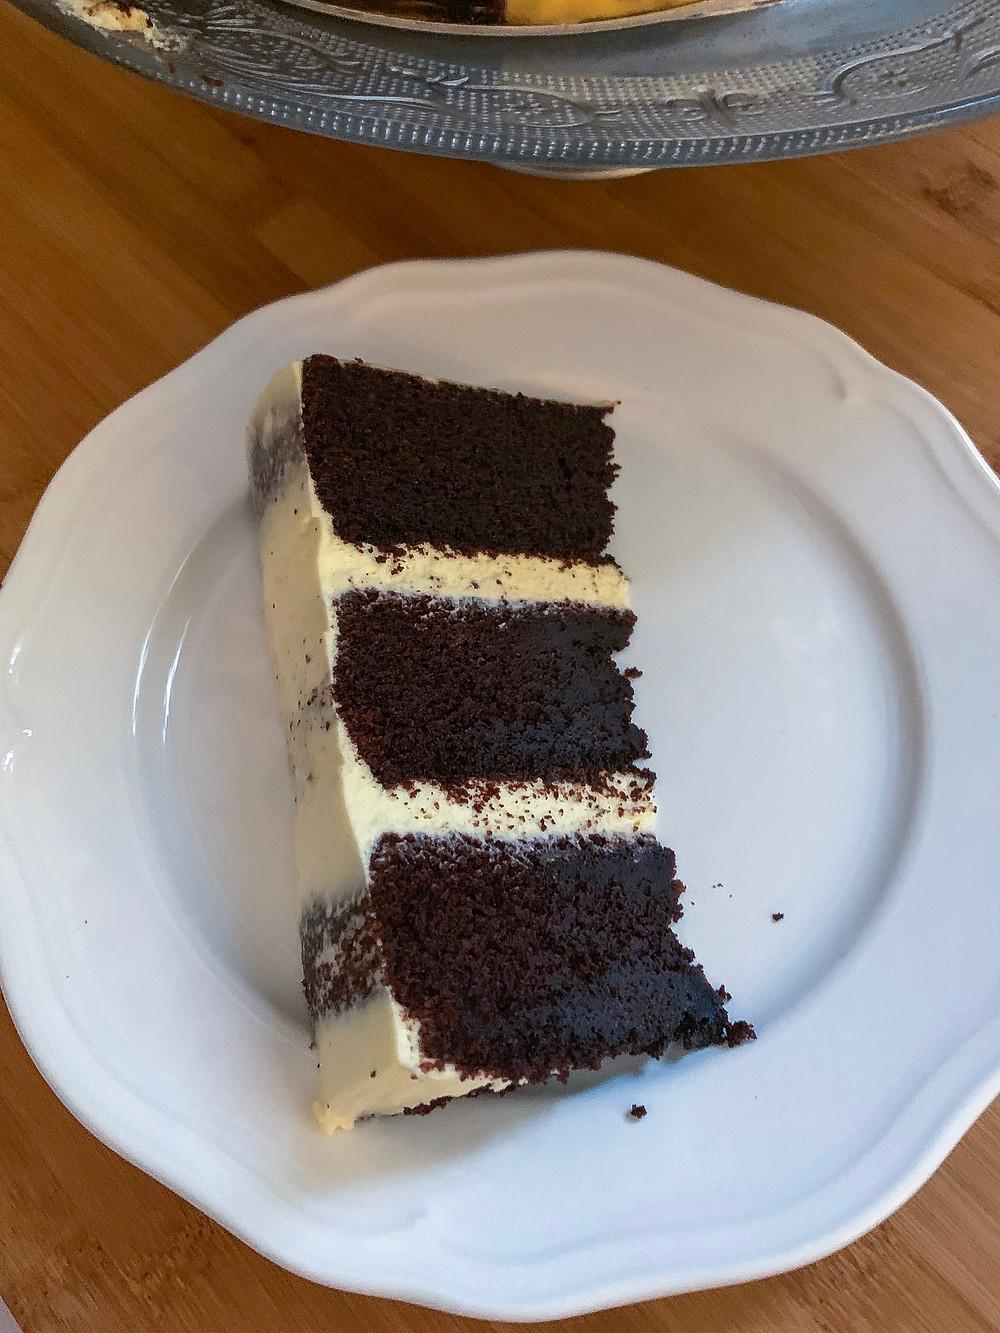 Magnolia kitchen signature chocolate cake, helenine čarovnije, chocolate cake, magnolia kitchen, bernadette, dessert, cake, baked goods